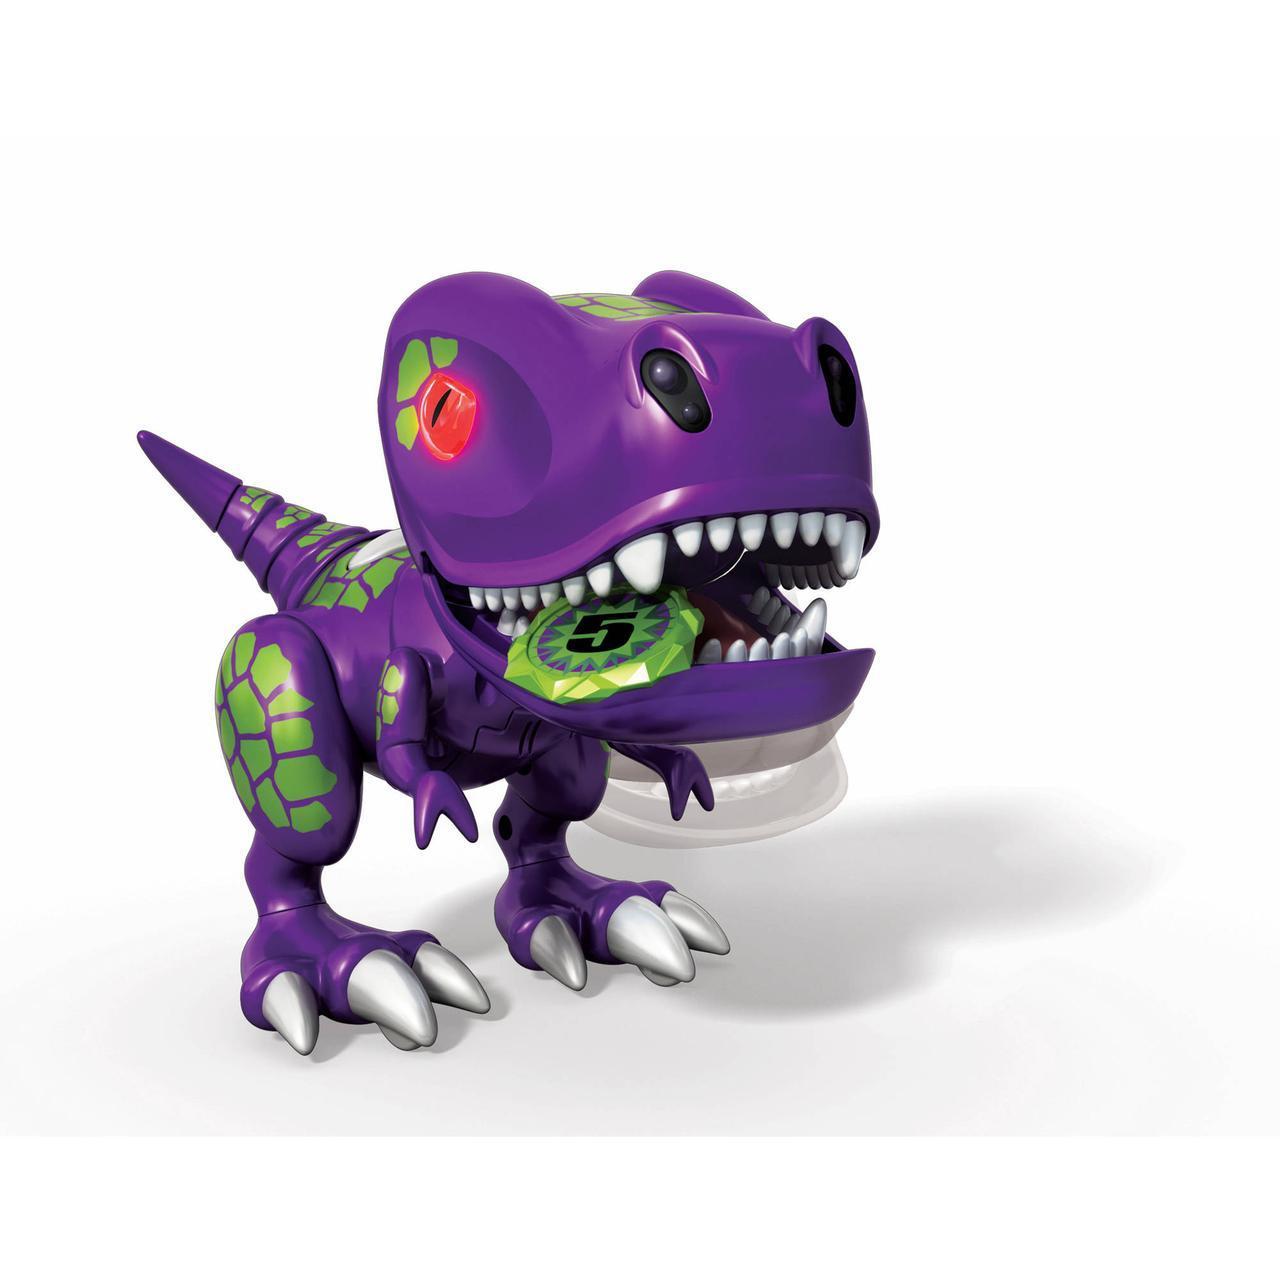 Интерактивный детеныш Динозавра Zoomer Chomplingz Dinosaur, Chance, Wal-Mart Exclusive